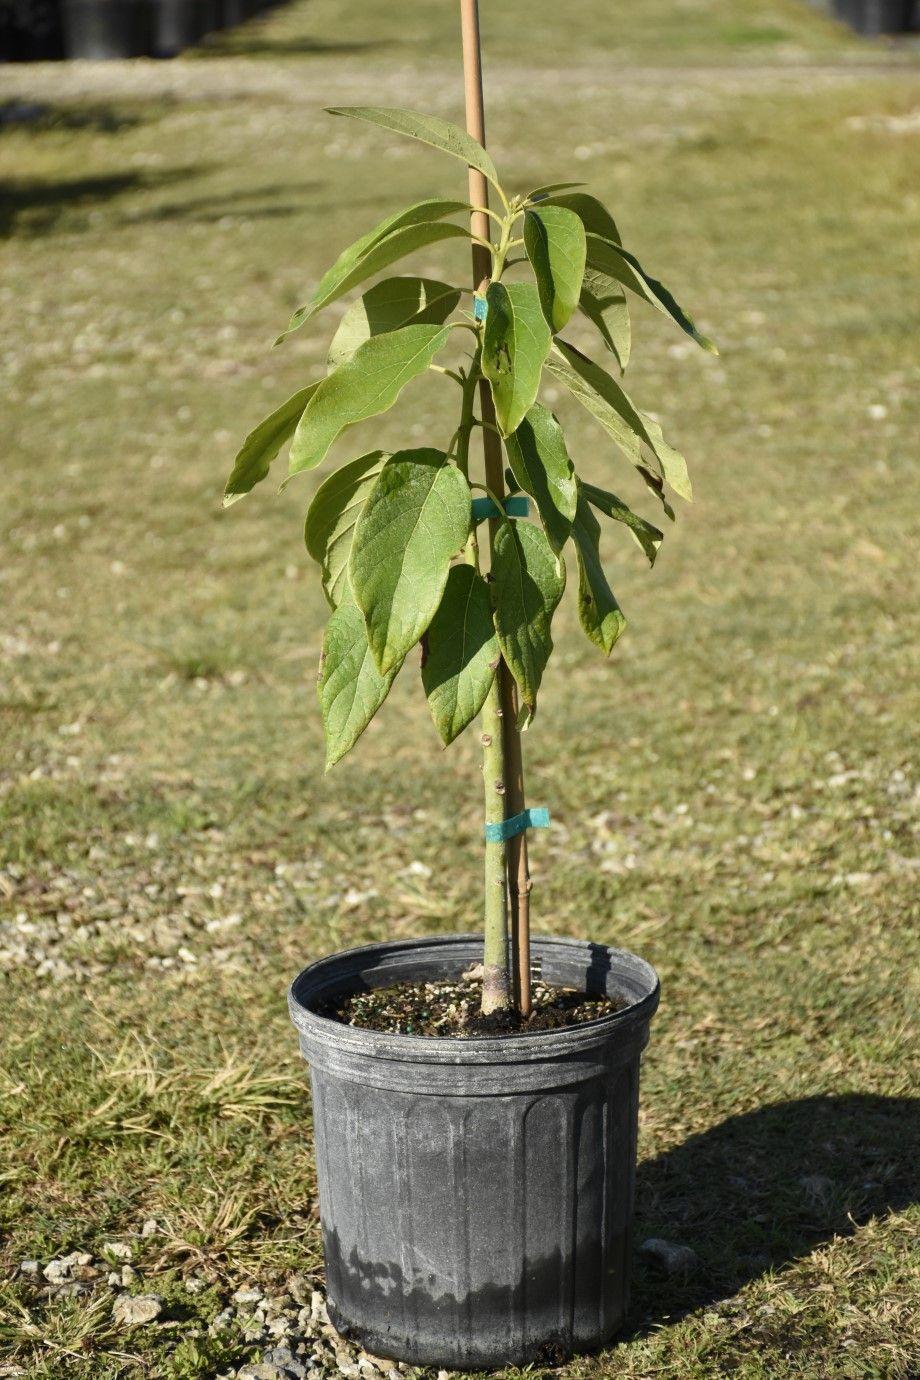 Choquette Avocado Trees to plant, Growing tree, Fruit trees